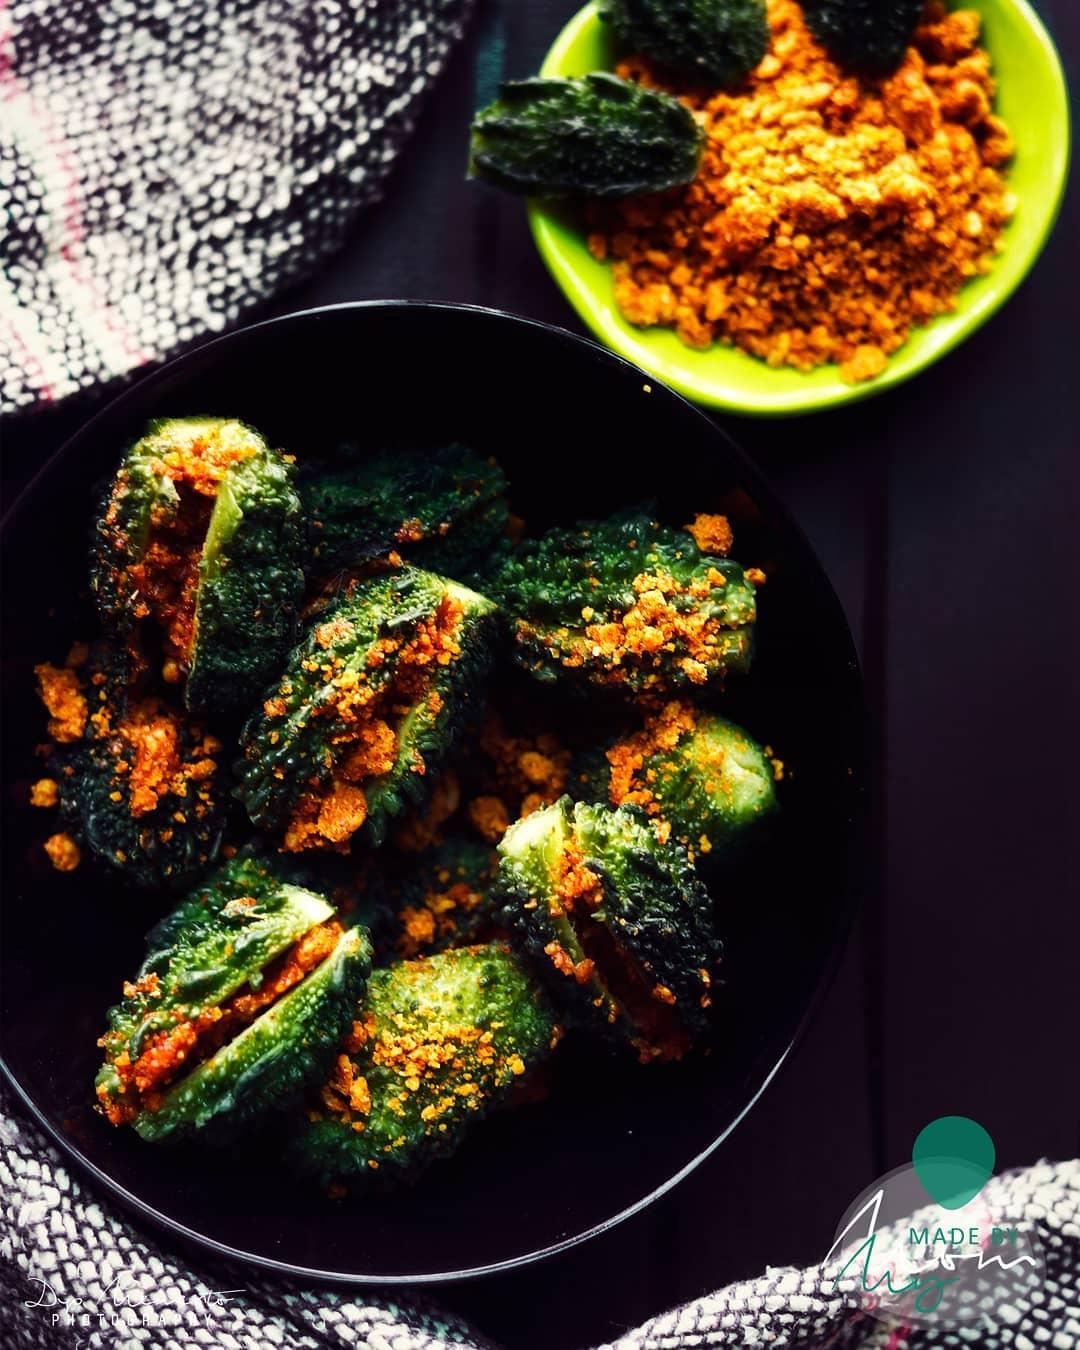 Stuffed Karela or Bharwan Karela or Stuffed Bitter Gourd, is gourd with besan masala. Stuffed Karela ... From #madebymom How many of you like it?? . . 🥒🥒🥒🍋🍋🍋🥔🥔🌶🌶 Food Shoot :@dip_memento_photography 🥒🥒🍋🍋🍋🥔🥔🌶🌶 . . #ahmedabad  #hungrito #foodporn #foodphotography #happymood  #happiness #foodpic #foodoftheday #foodlover #foodie #foodlove #foodporn #hungrito #productPhotography #Productshoot #foodclicks #aighungrito  #fooddi #happyPeople  #picoftheday #photoholic #magazine #magazineshoot  #magazinephotography #ahmedabadifoodholics